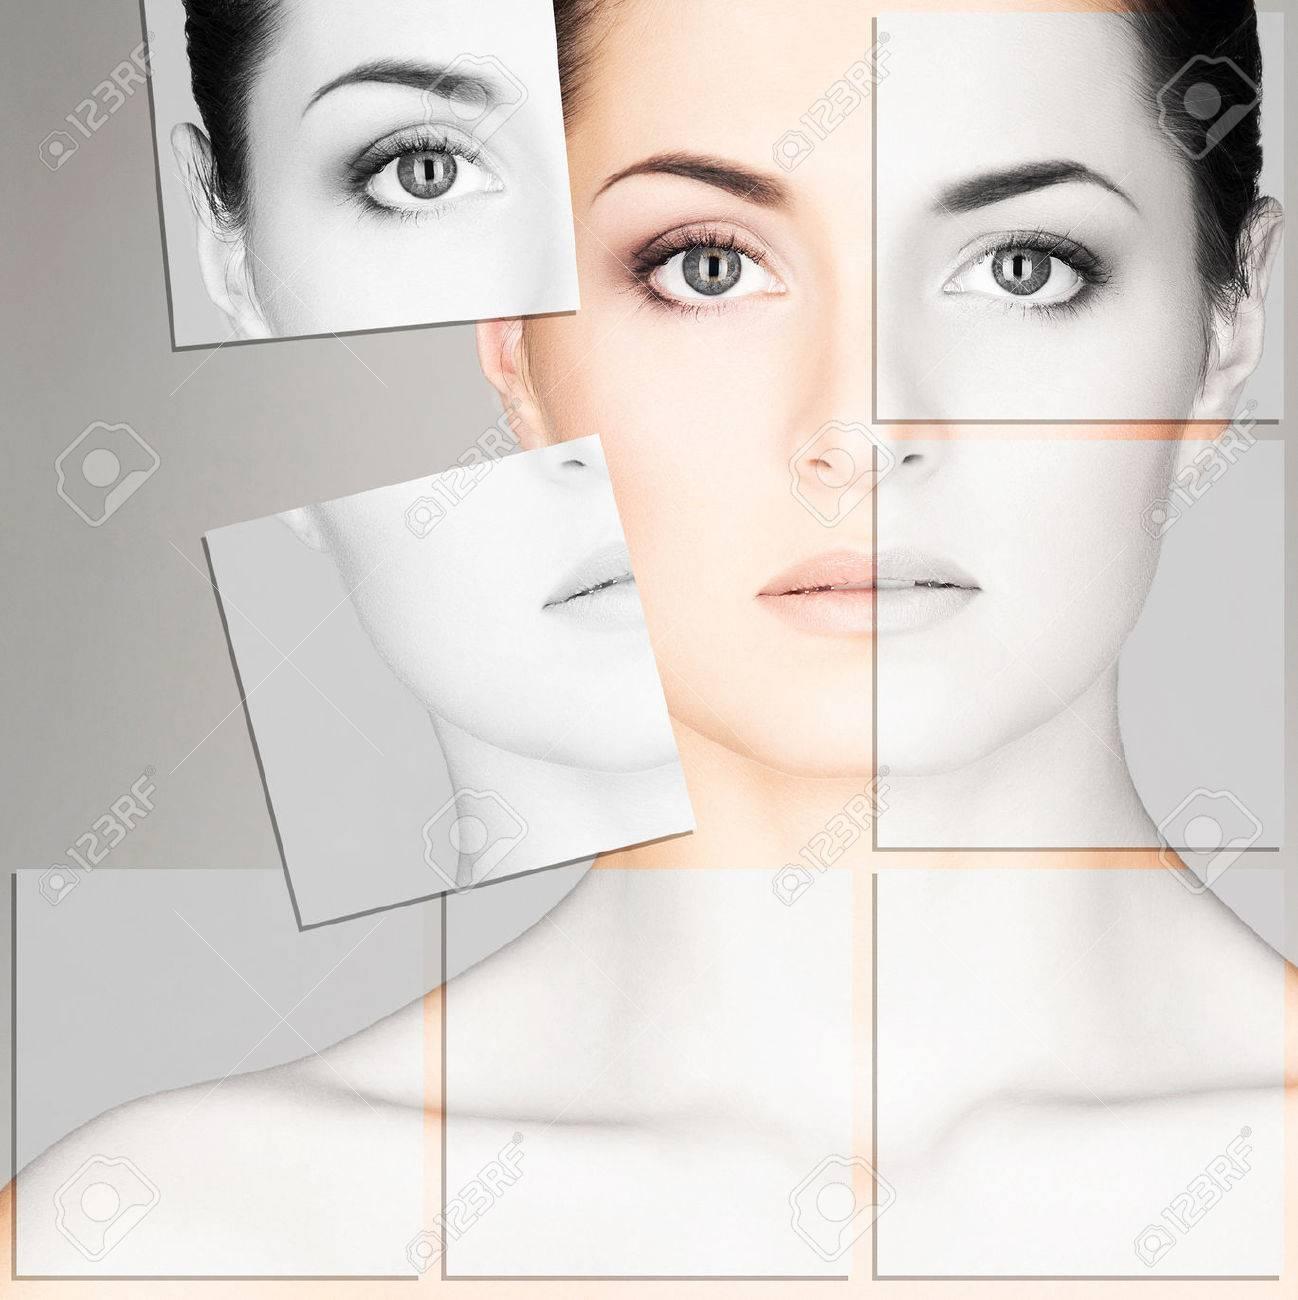 Косметика пластическая хирургия